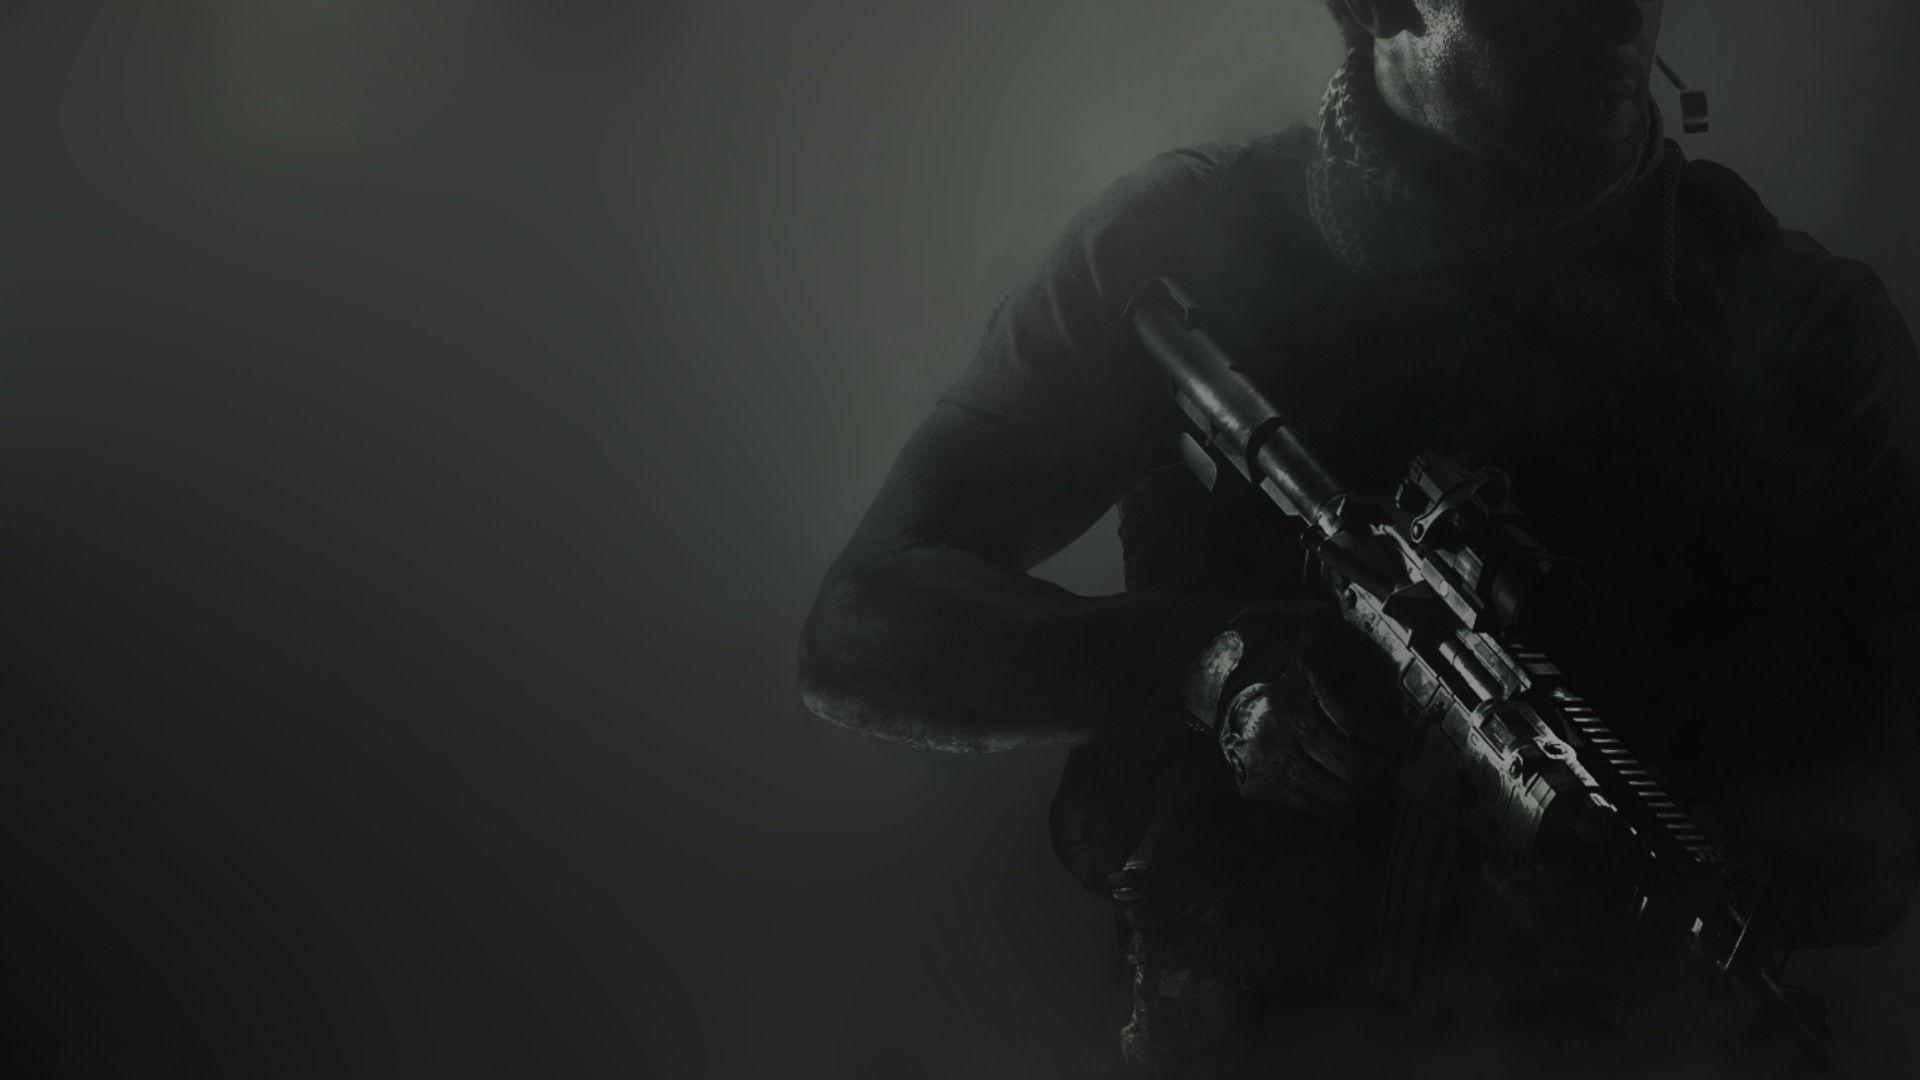 Call of Duty Wallpaper 091